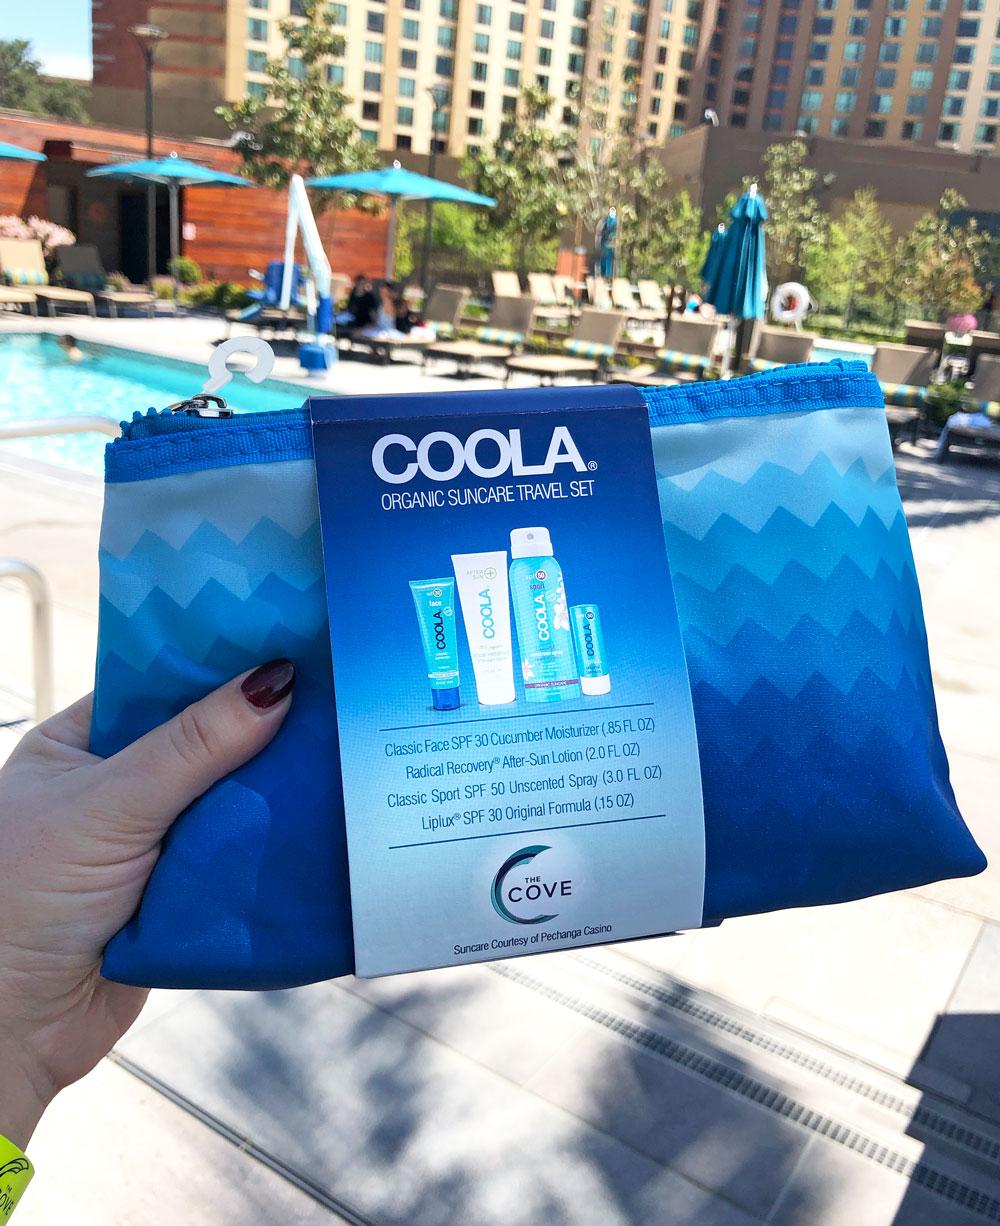 COOLA Organic Suncare Travel Set at The Cove Pechanga